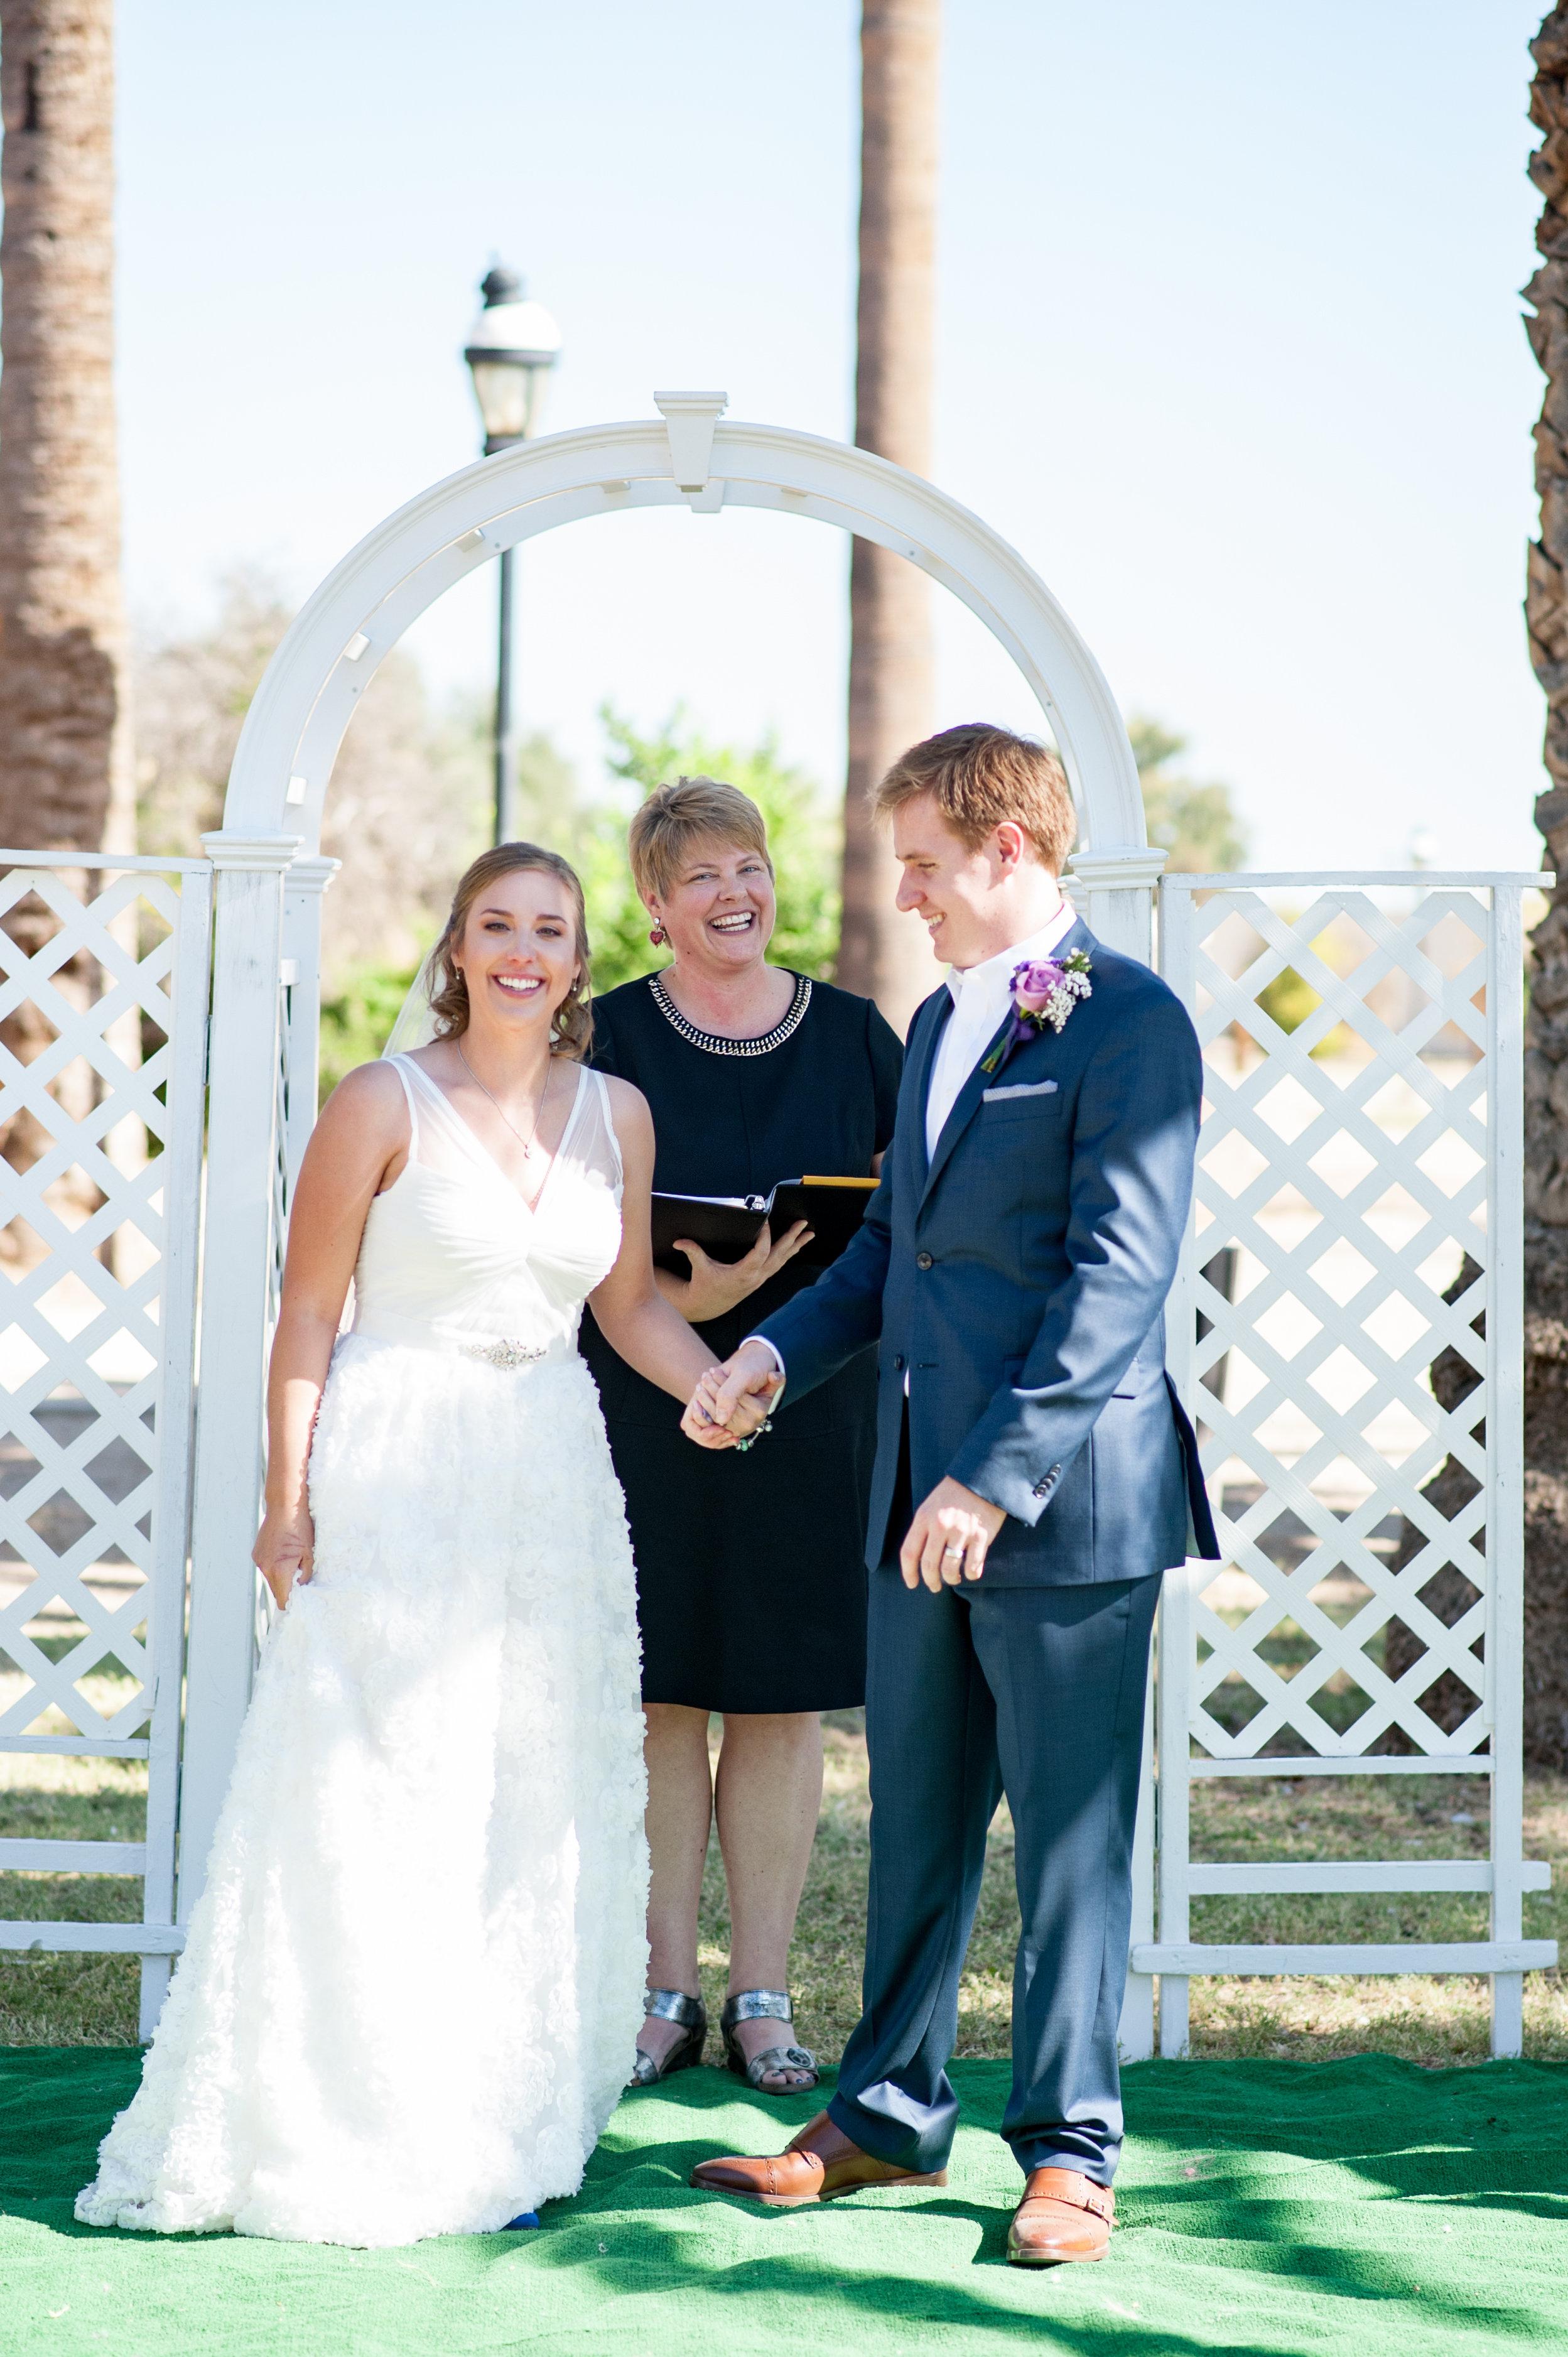 AZ Weddings By Amy, Ben and Amy